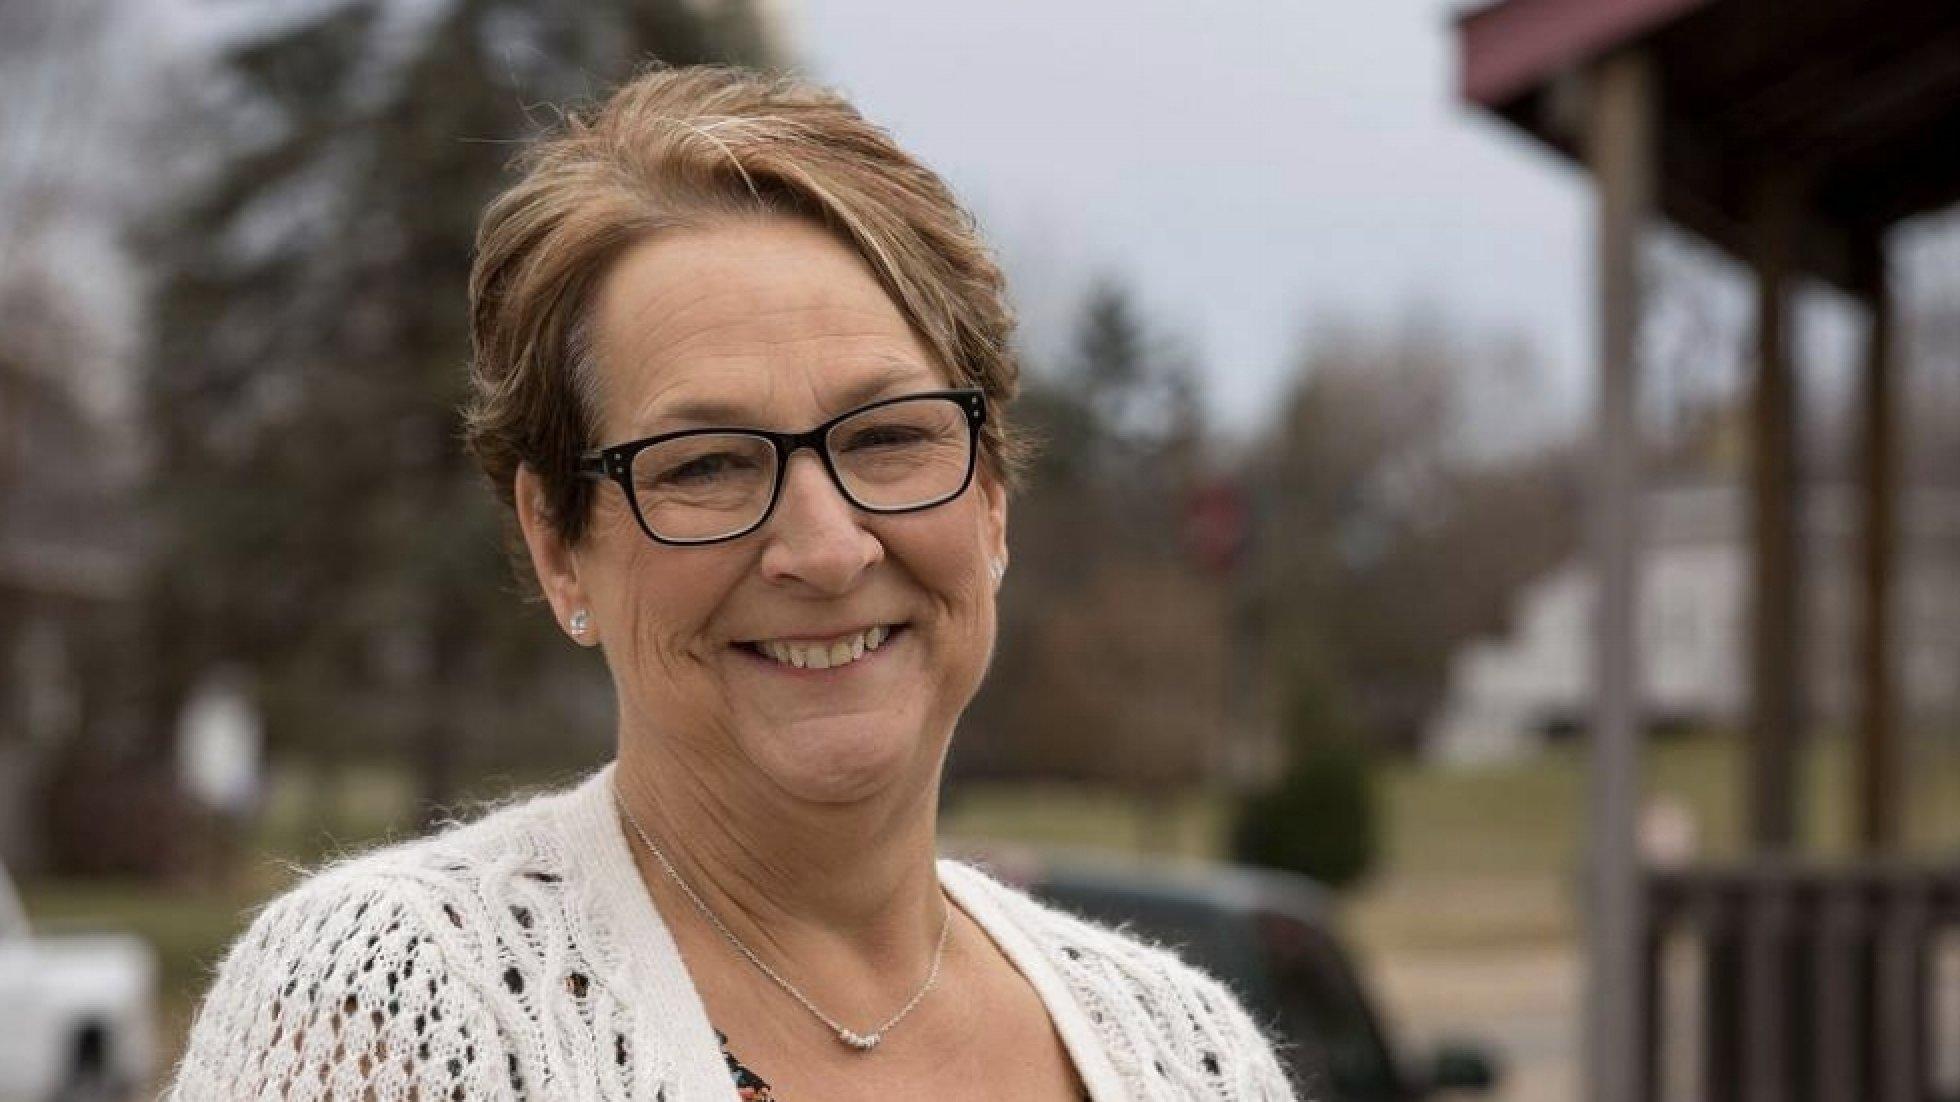 JUST IN: Dem wins Wisconsin state Senate seat in district Trump won by 17 points https://t.co/JEK1FezLfF https://t.co/WJqbKQspzf